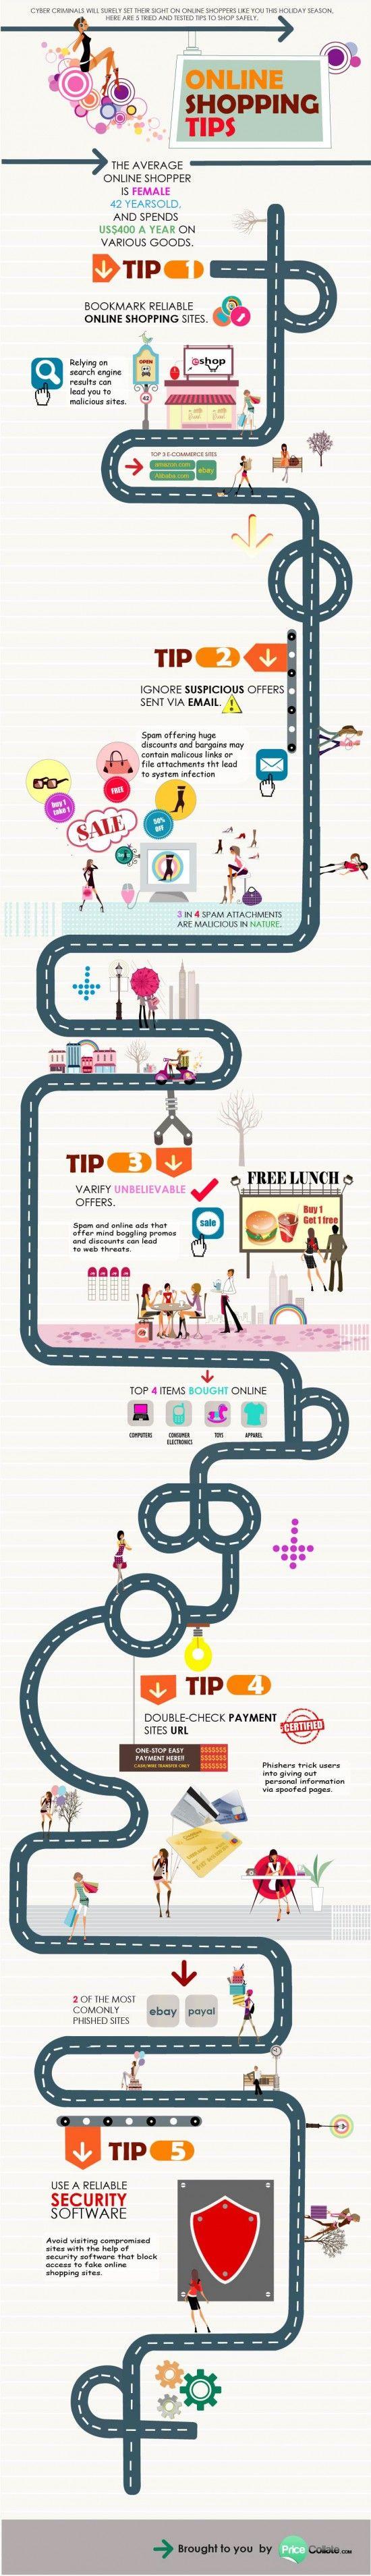 5 Tips on Shopping Online #ecommerce